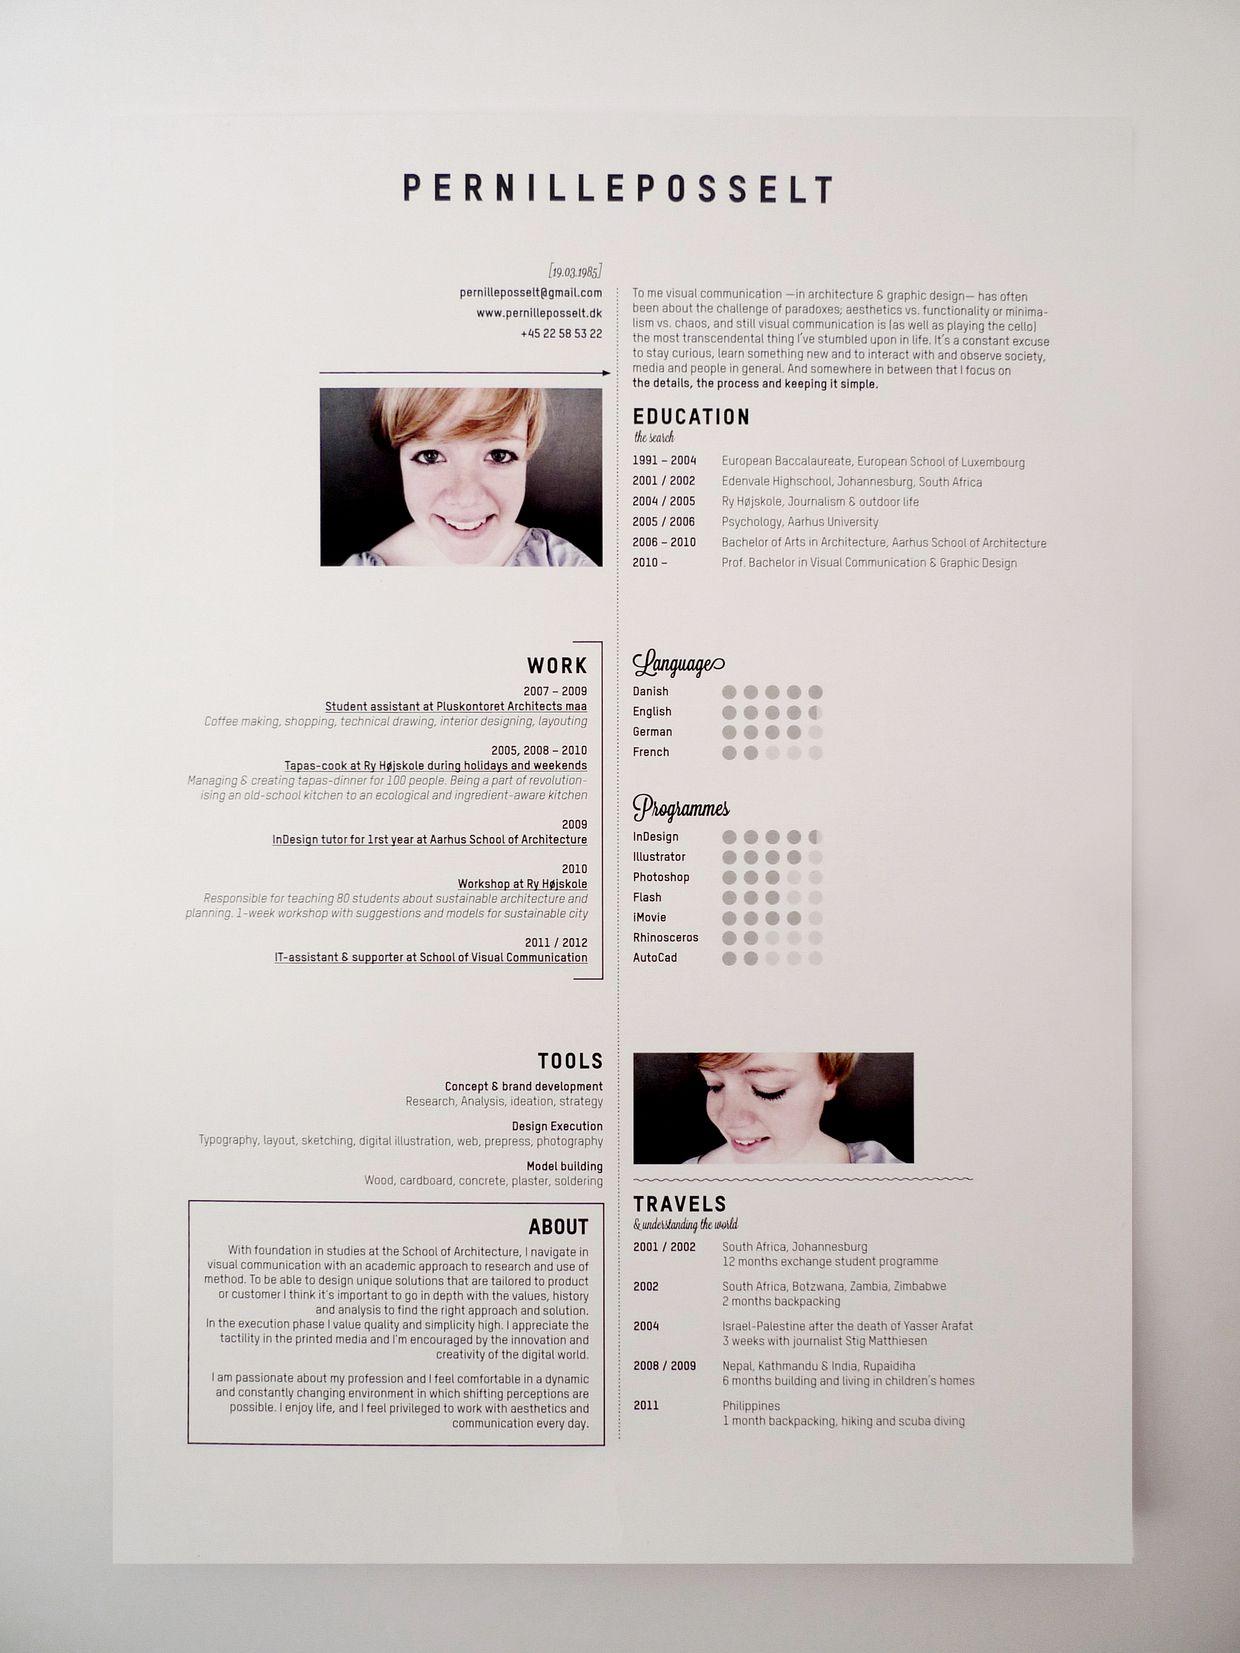 Pernille Posselt | curiculum vitae design | Pinterest | Cv ideas ...